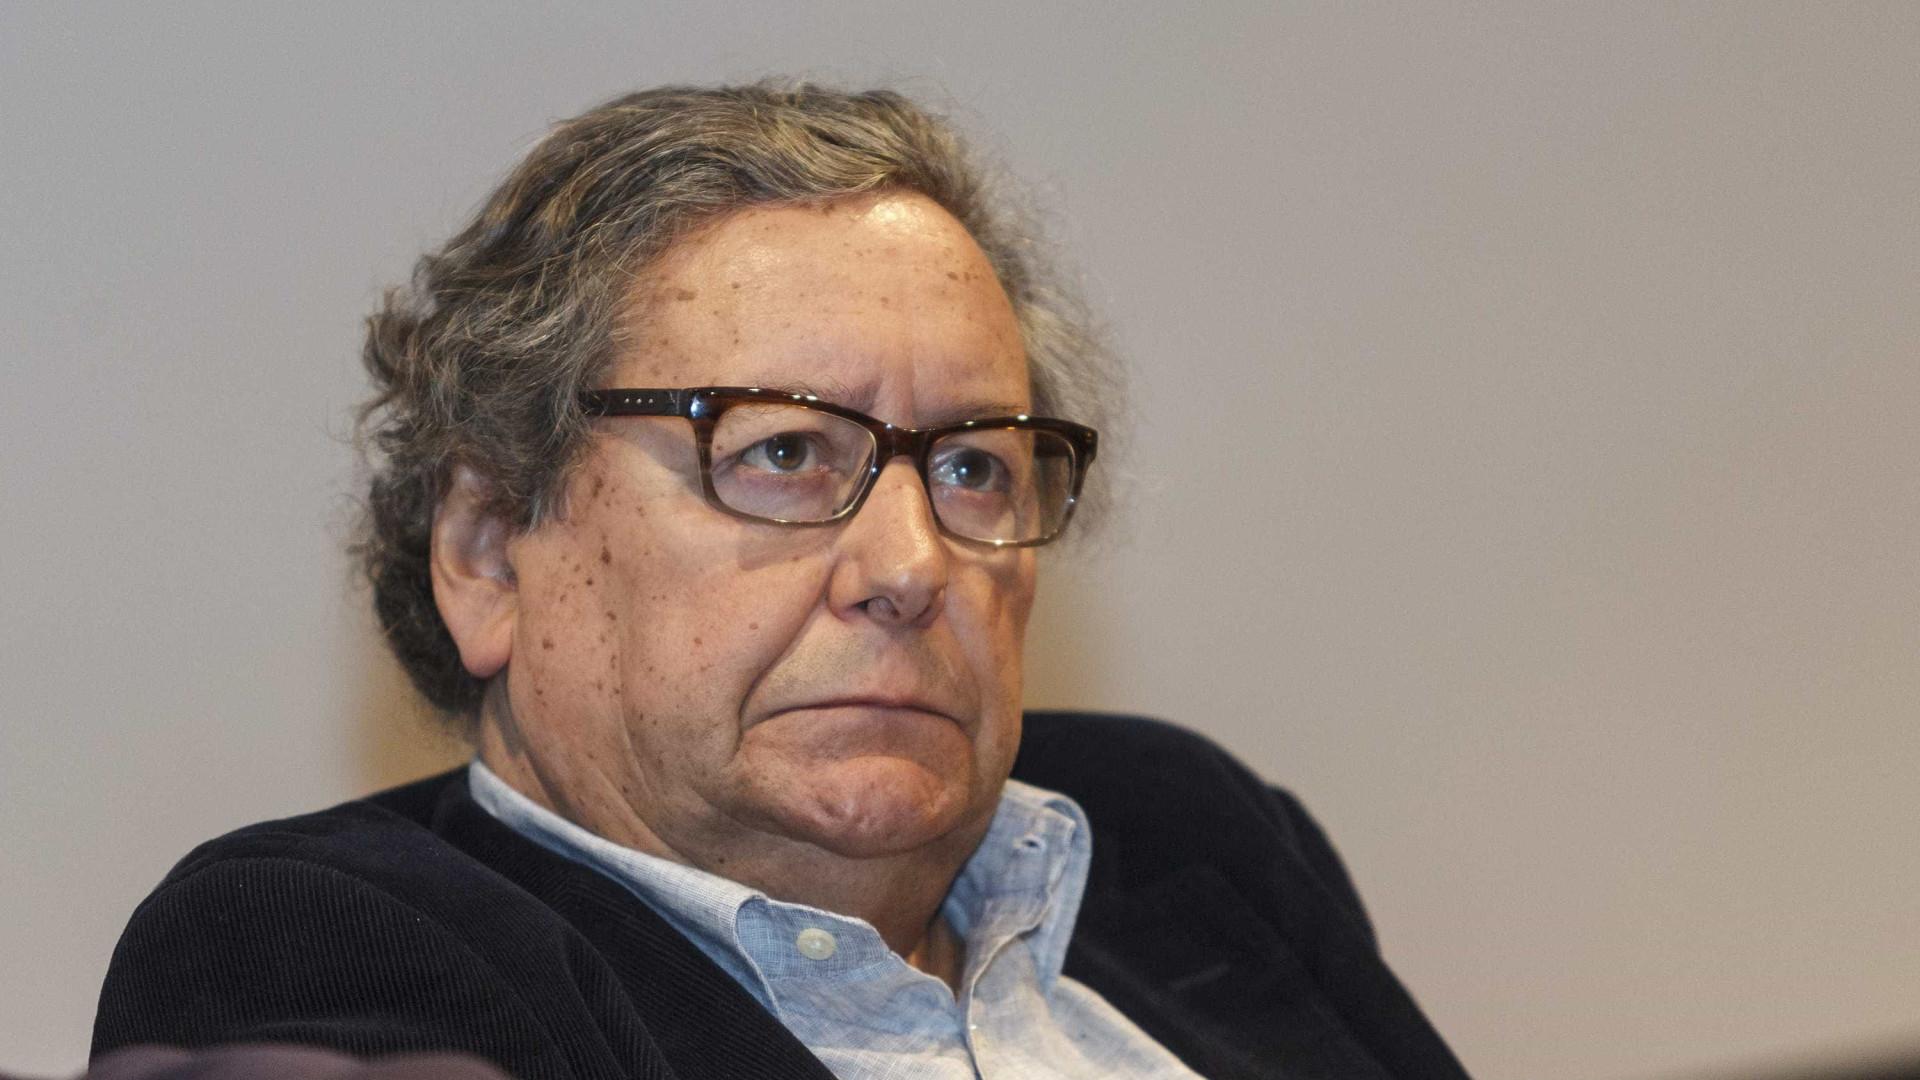 Fernando Paulouro vence prémio Eduardo Lourenço 2017